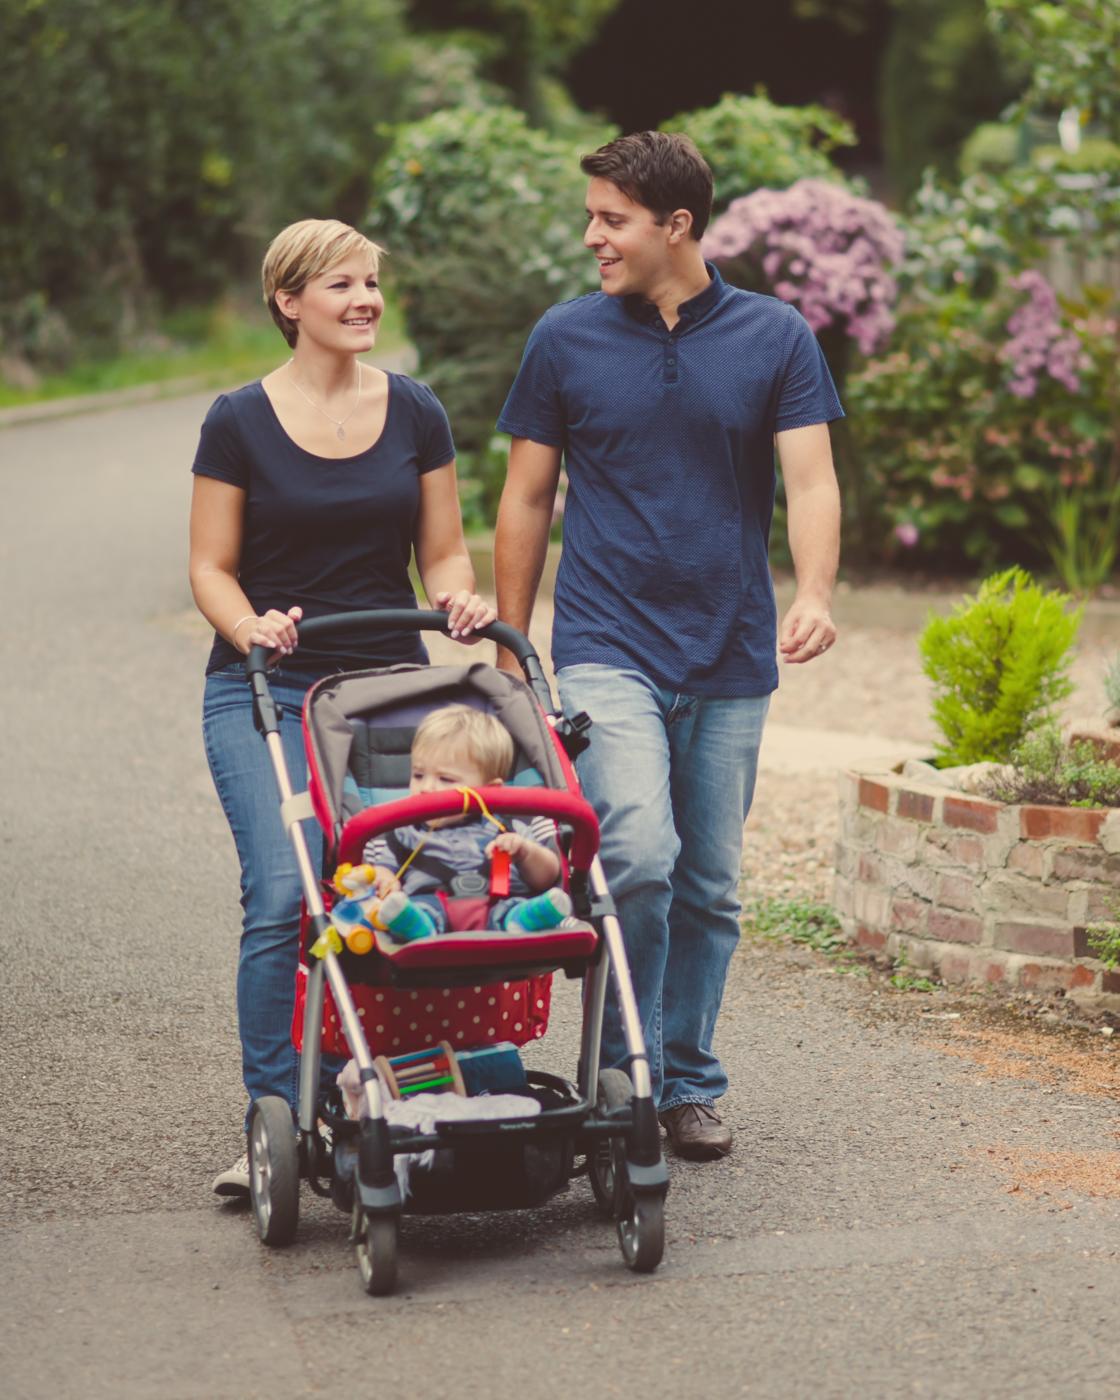 013 - Kelly, Matthew and Hugo Fine Art Family Photography by www.mpmedia.co.uk -80.JPG